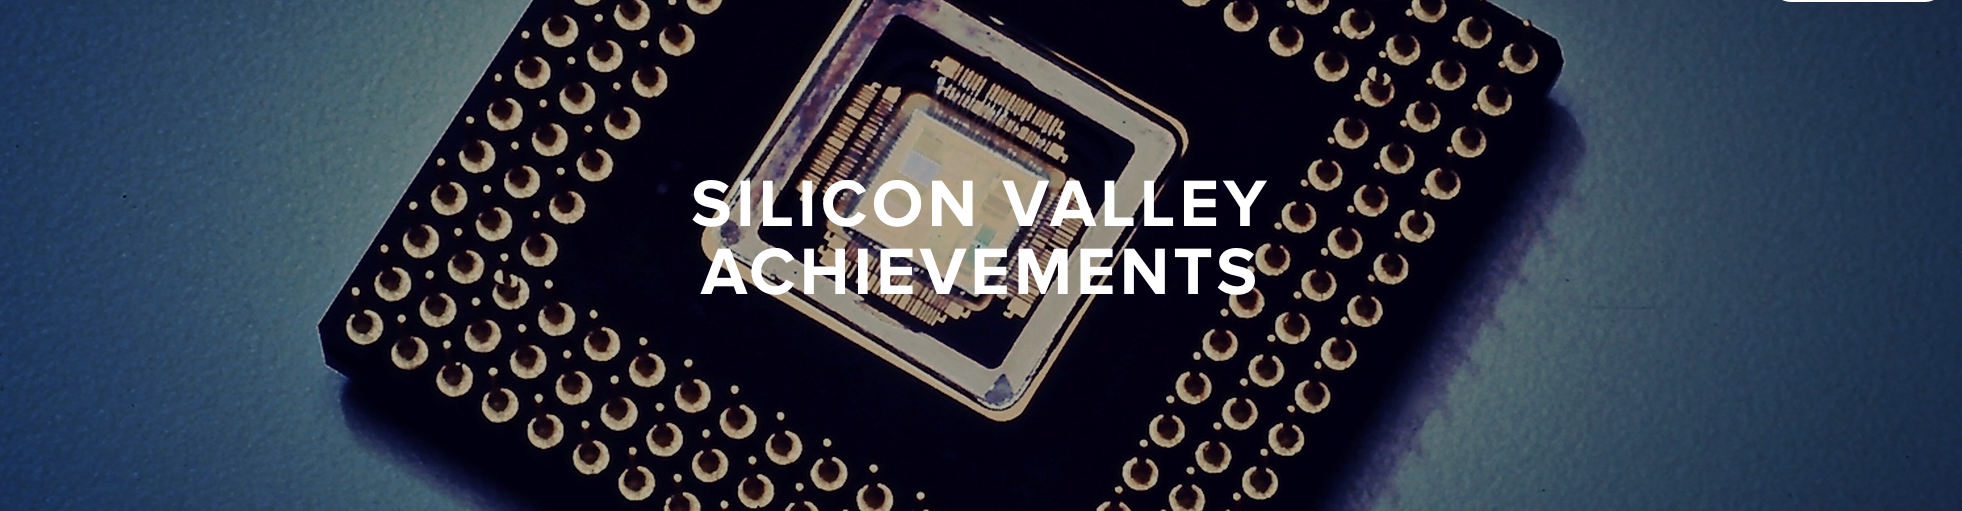 Silicon Valley Achievements